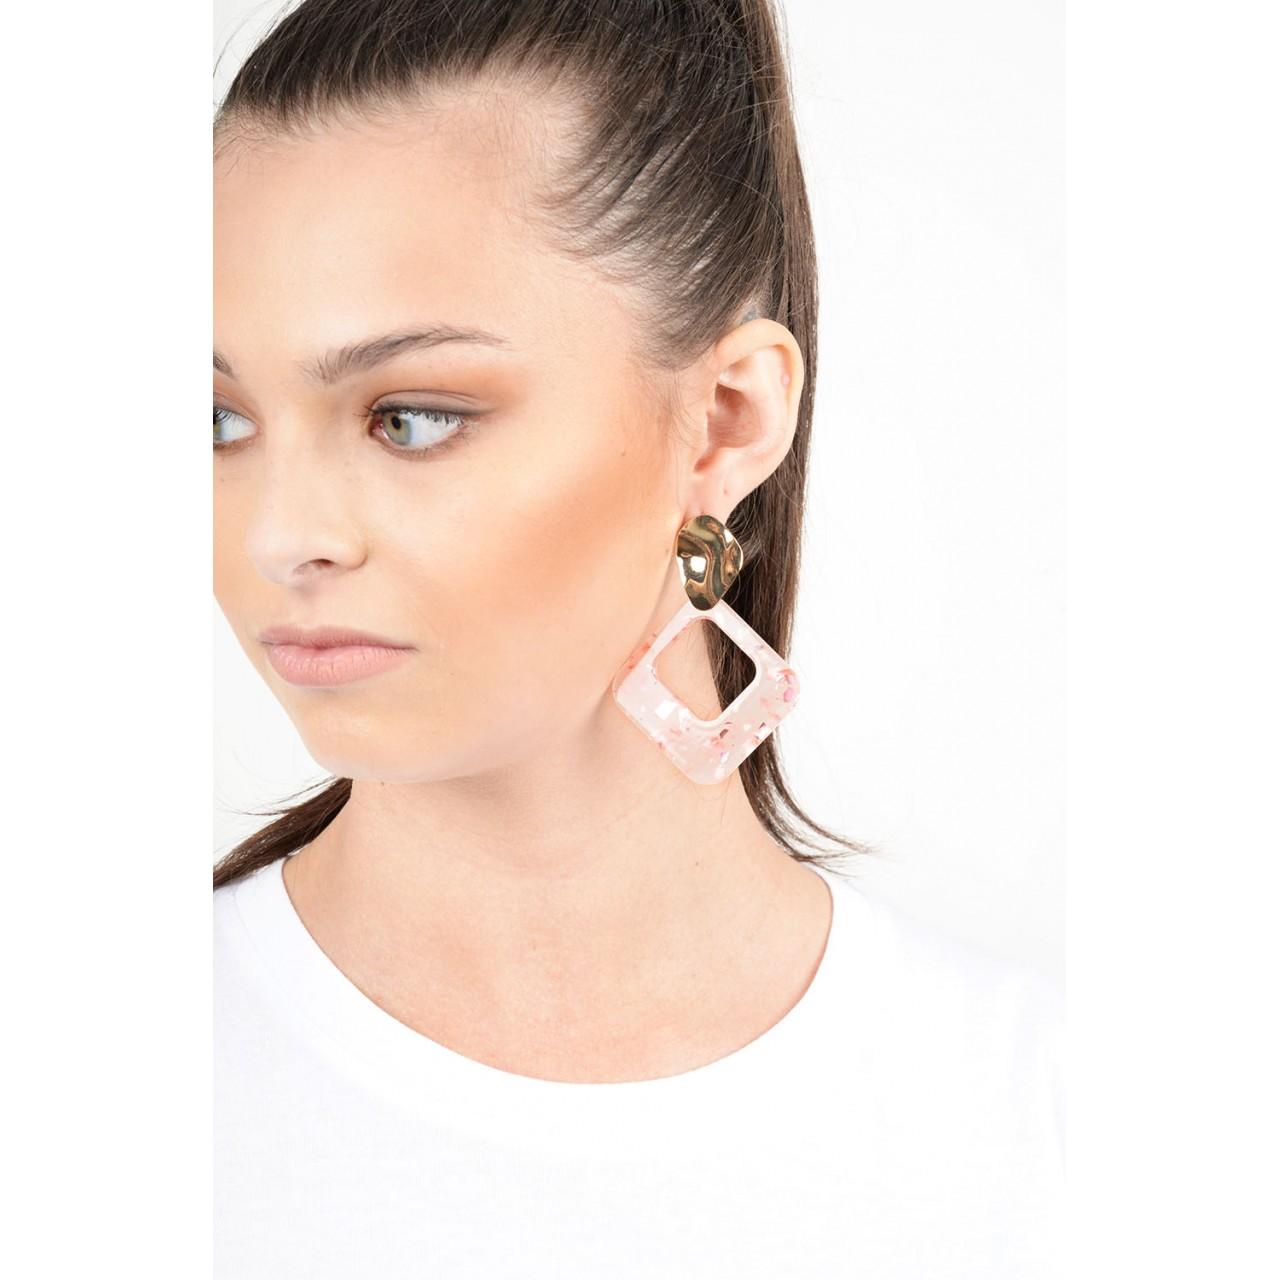 Hanging earings